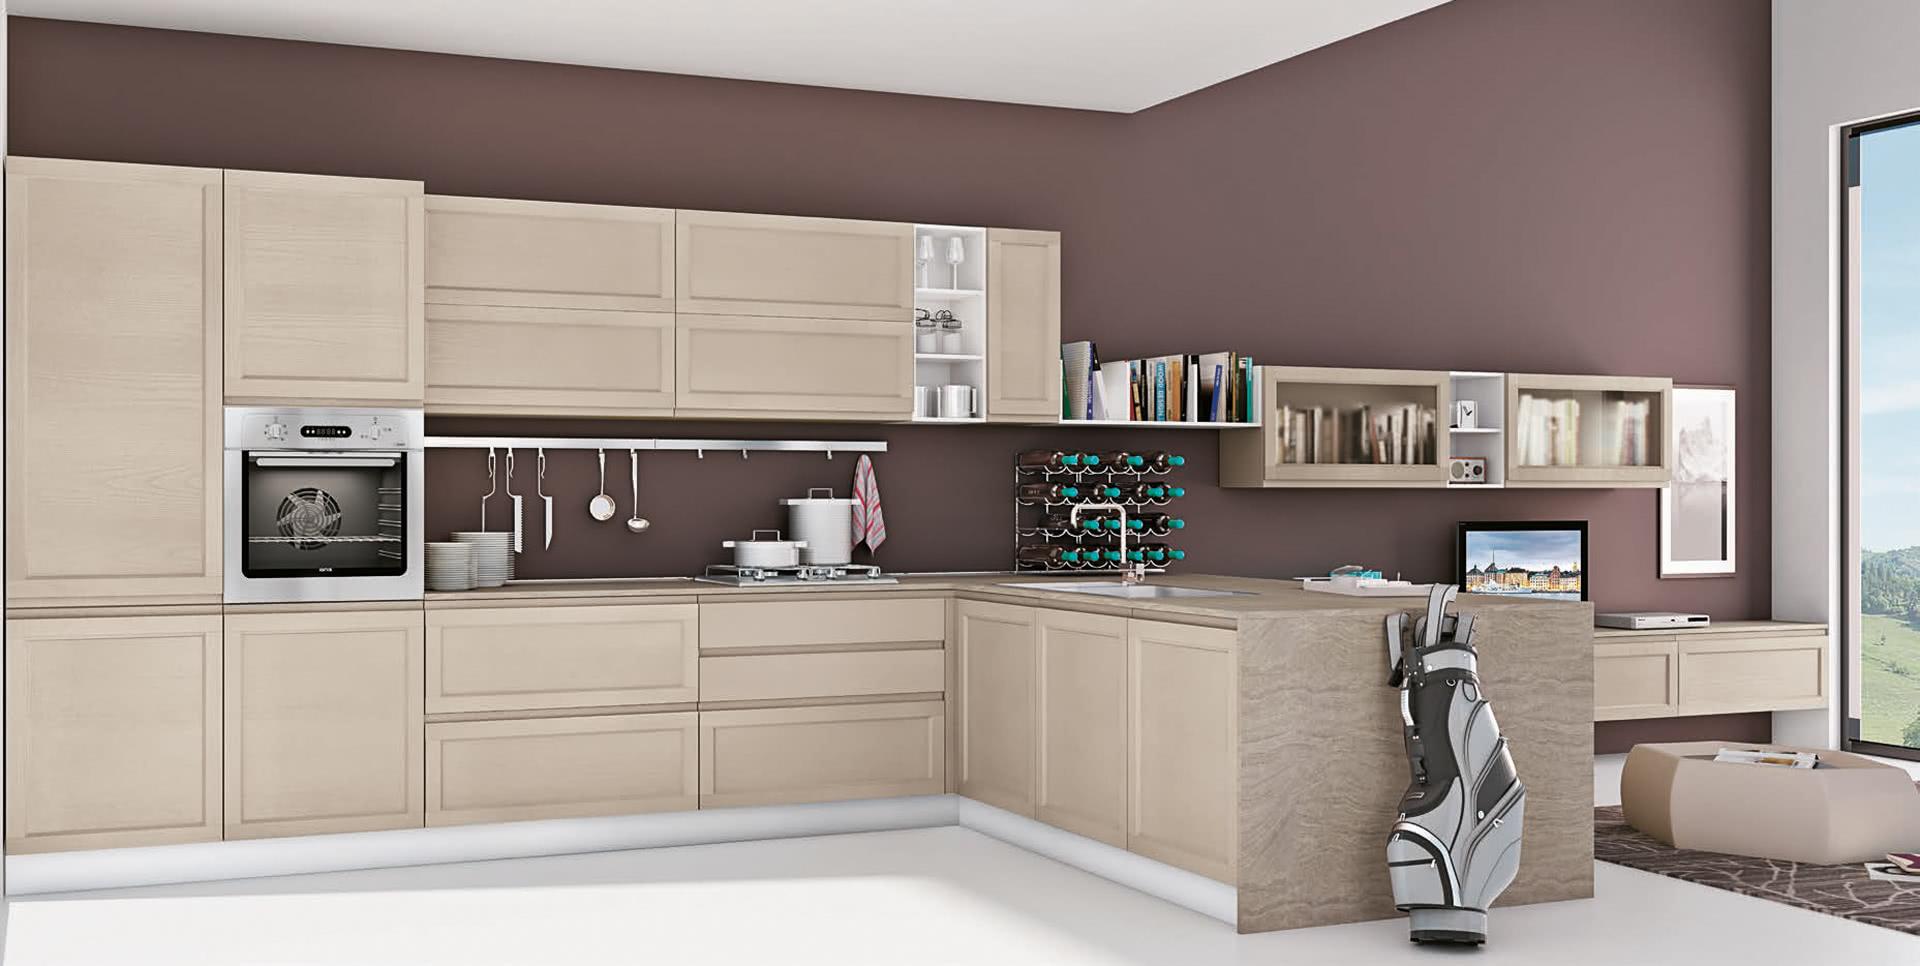 Cucina classica lube selma creo kitchens - Cucine lineari moderne ...